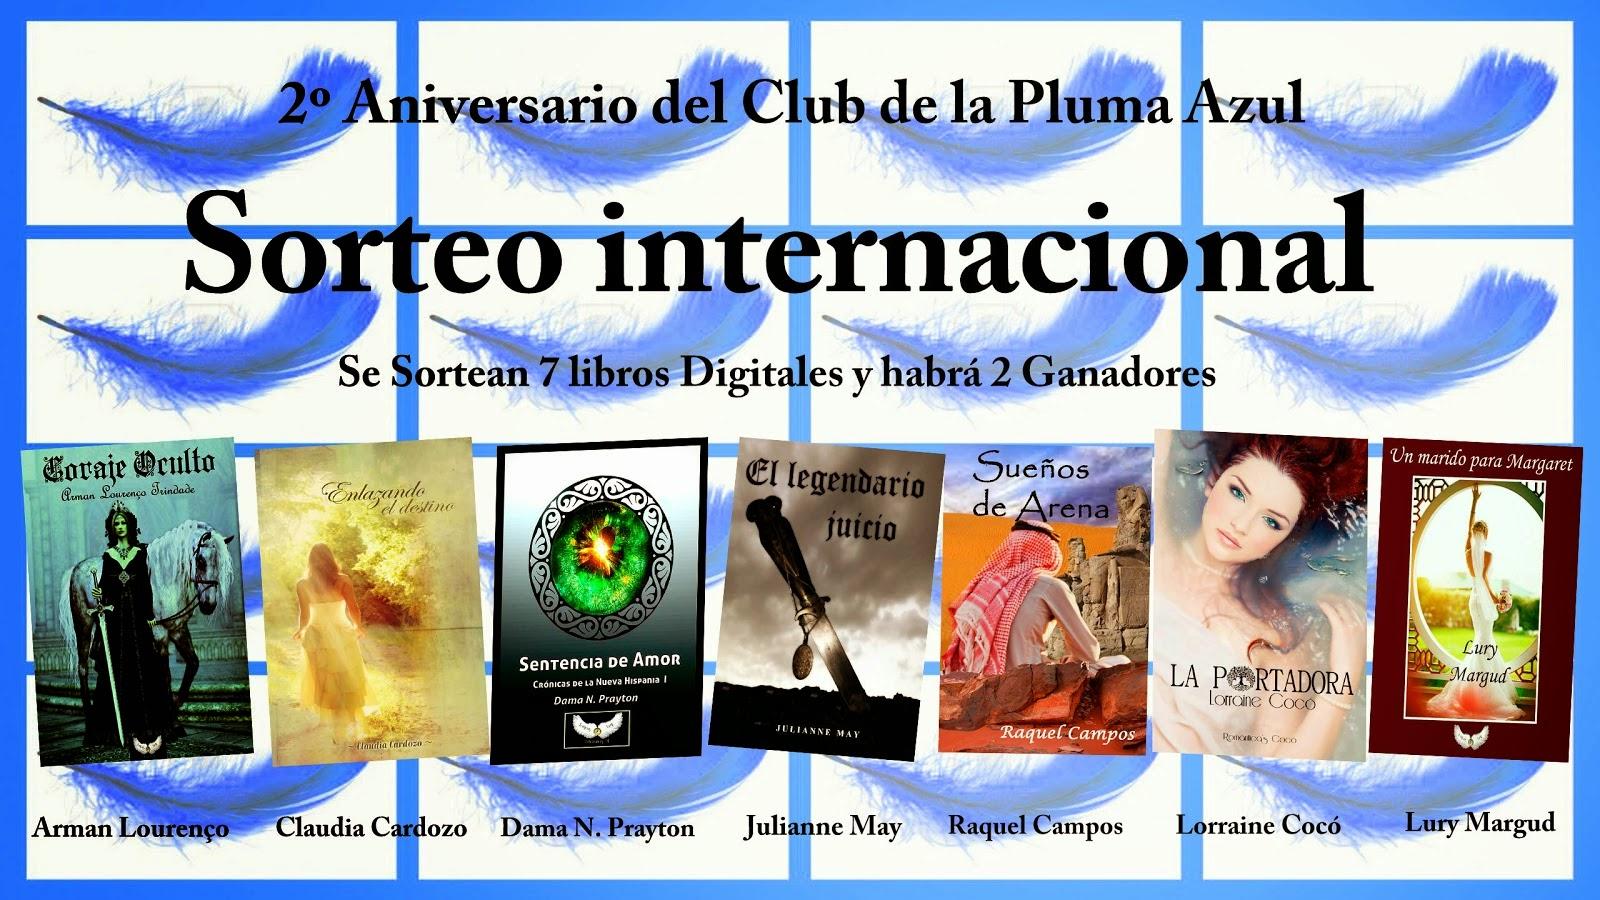 2º aniversario del Club de la Pluma Azul